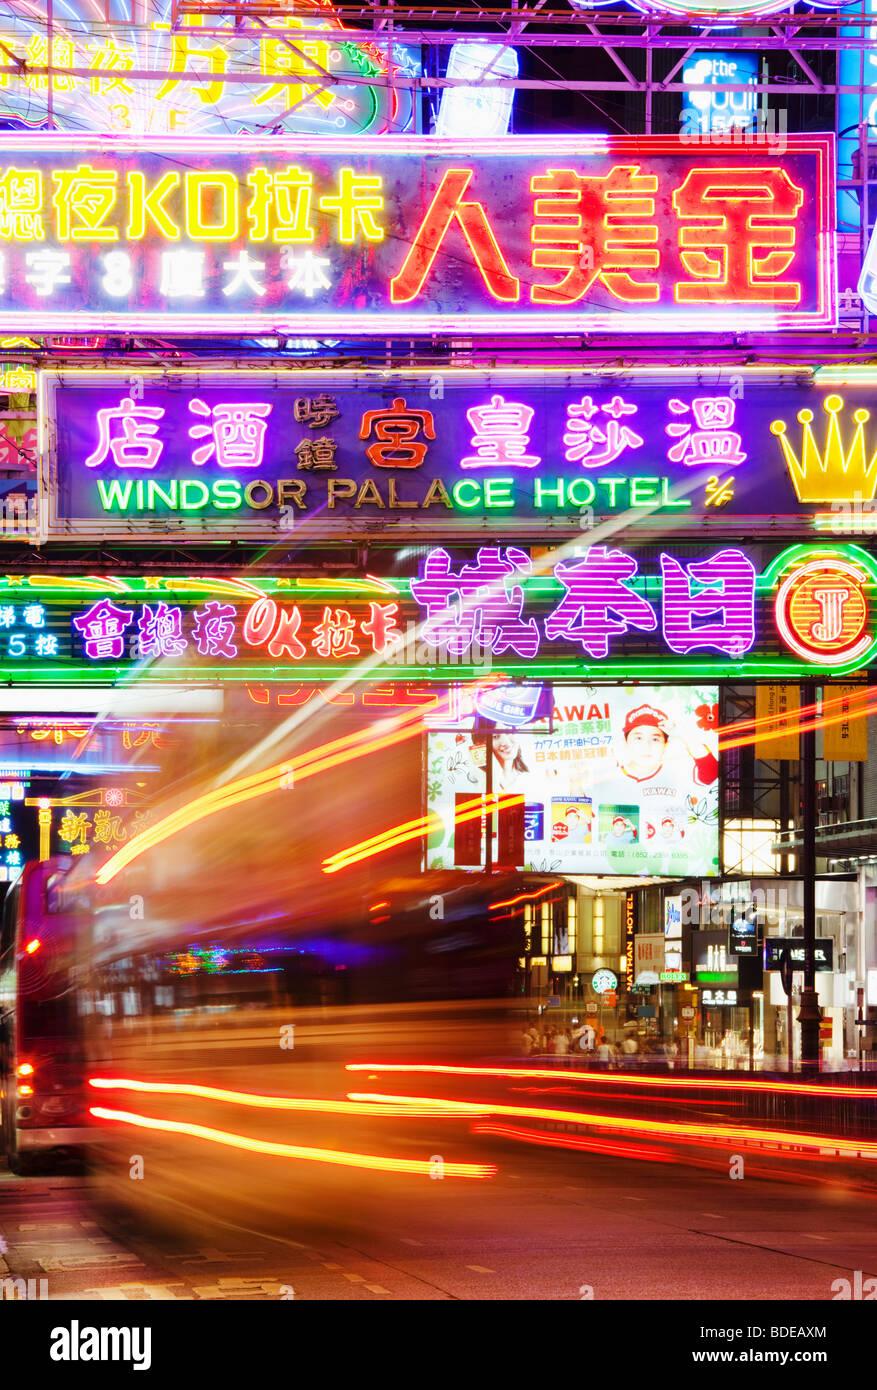 Letreros de neón y luz de autobús trail en Tsim Sha Tsui, Kowloon, Hong Kong, China. Imagen De Stock